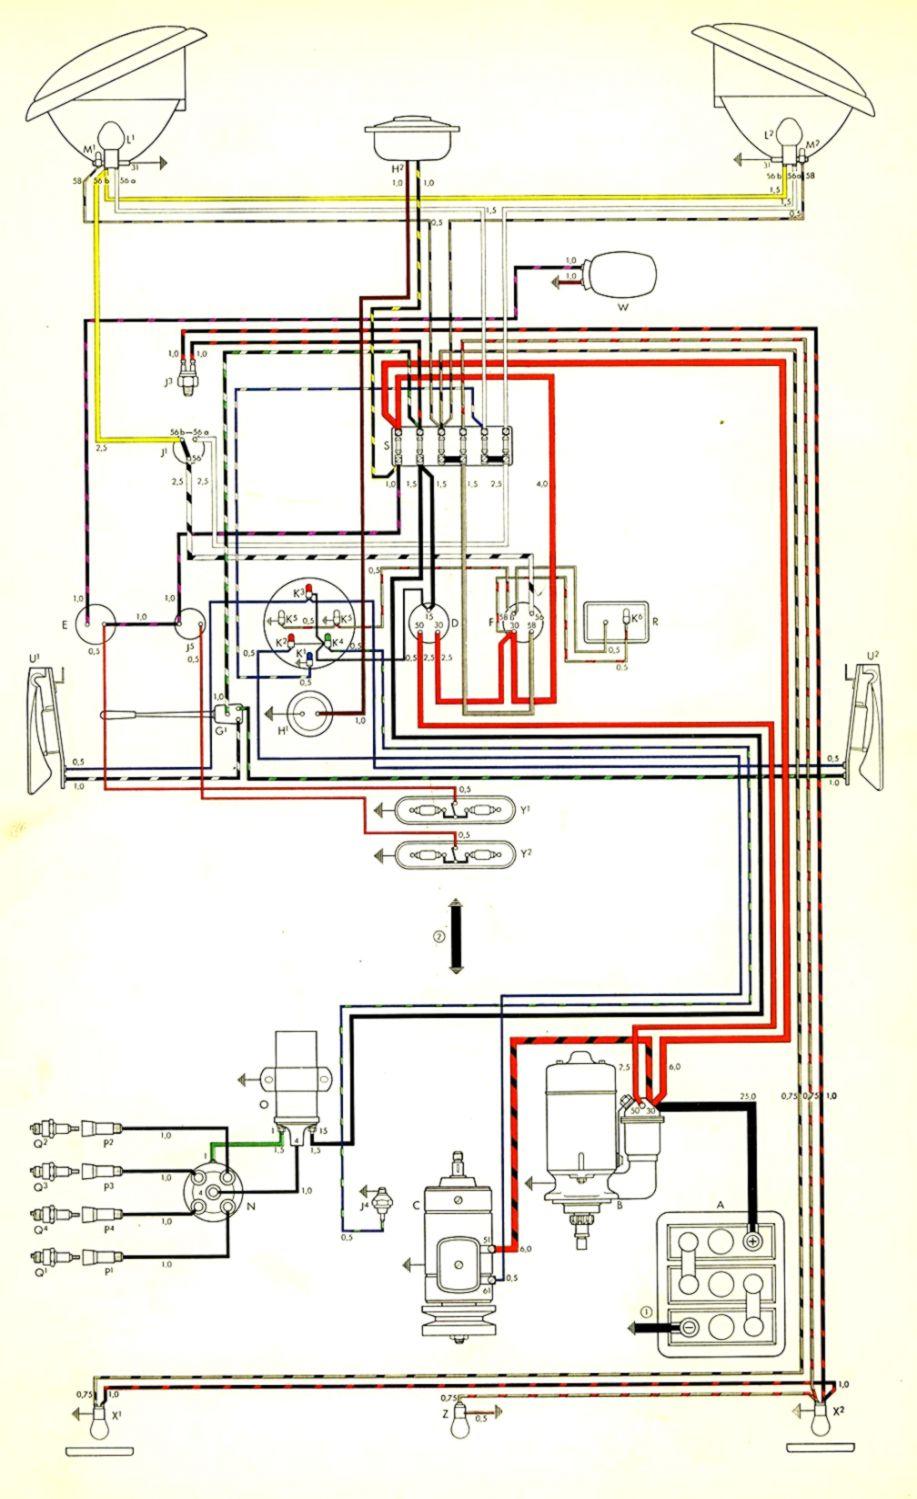 vw bus wiring diagrams wiring diagram rows 1972 vw bus wiring diagram vw bus regulator wiring [ 917 x 1499 Pixel ]